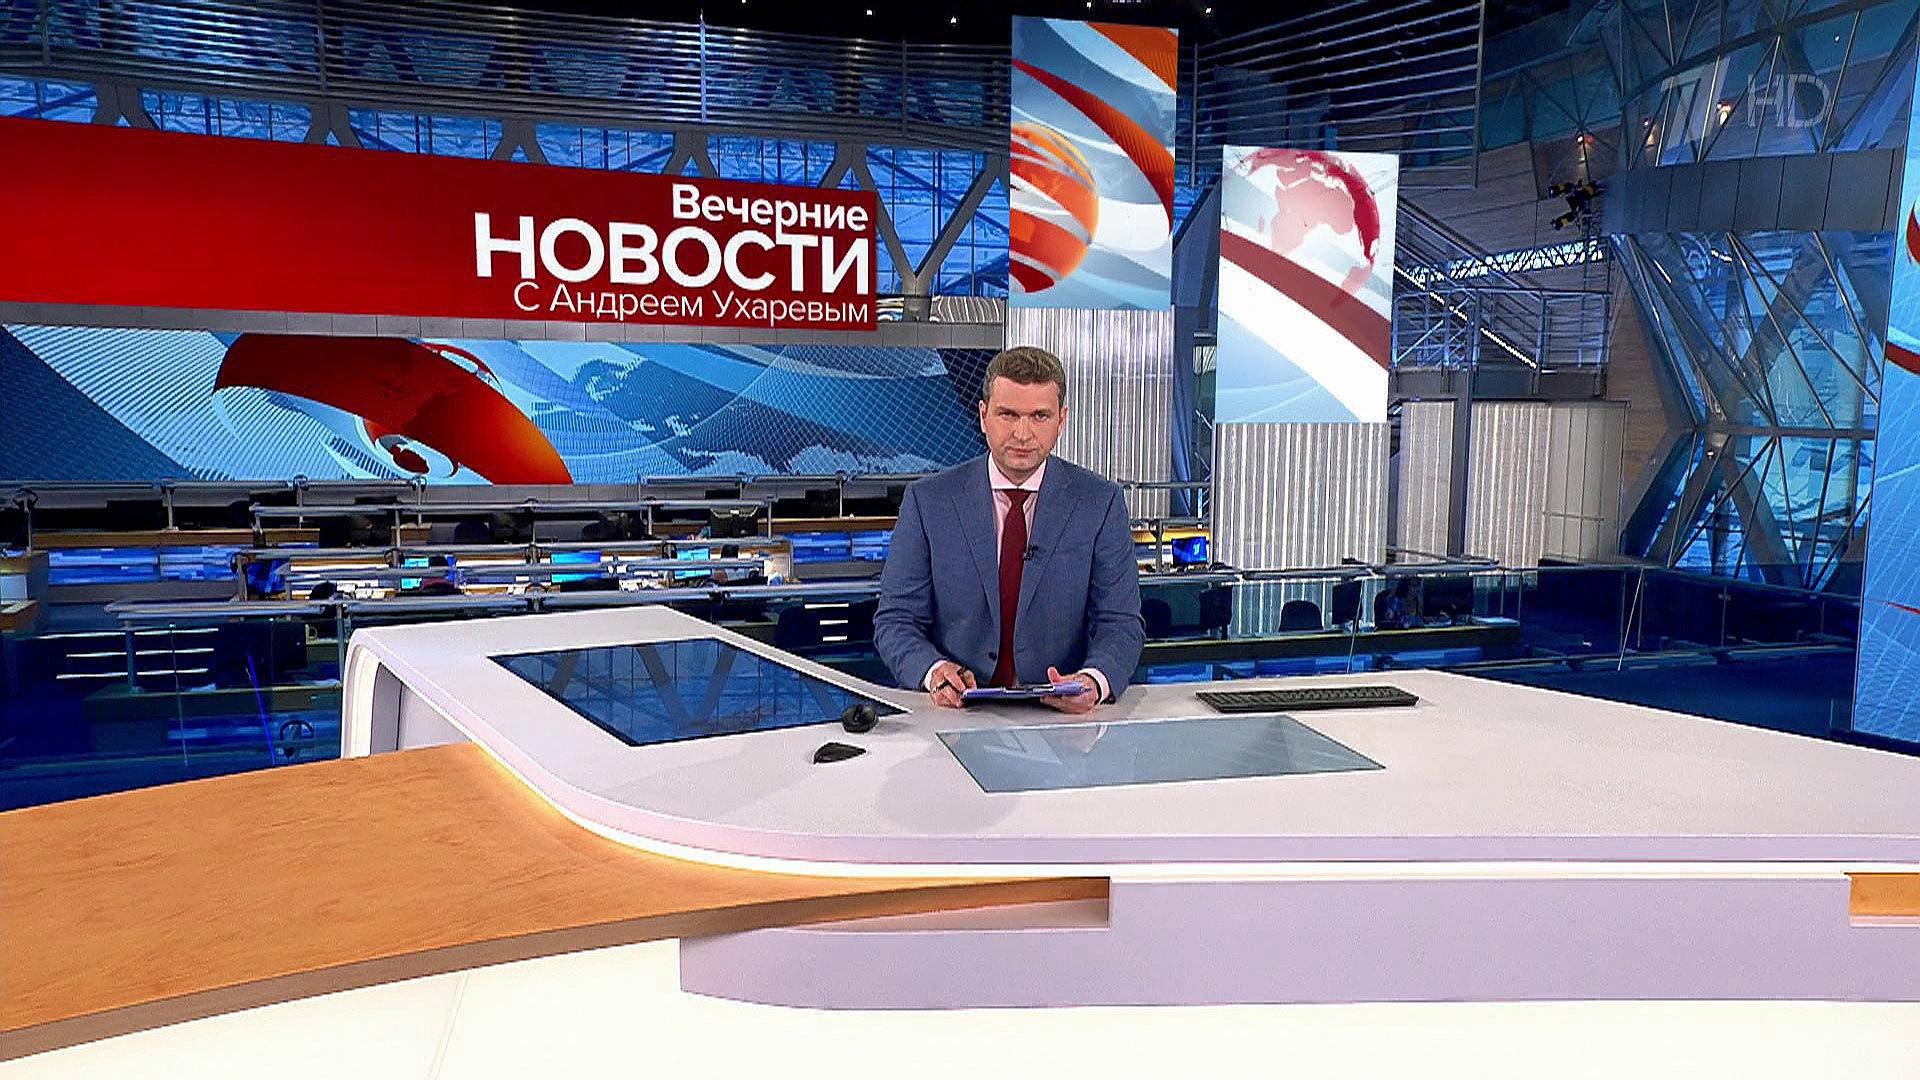 Вечерние новости (ссубтитрами)